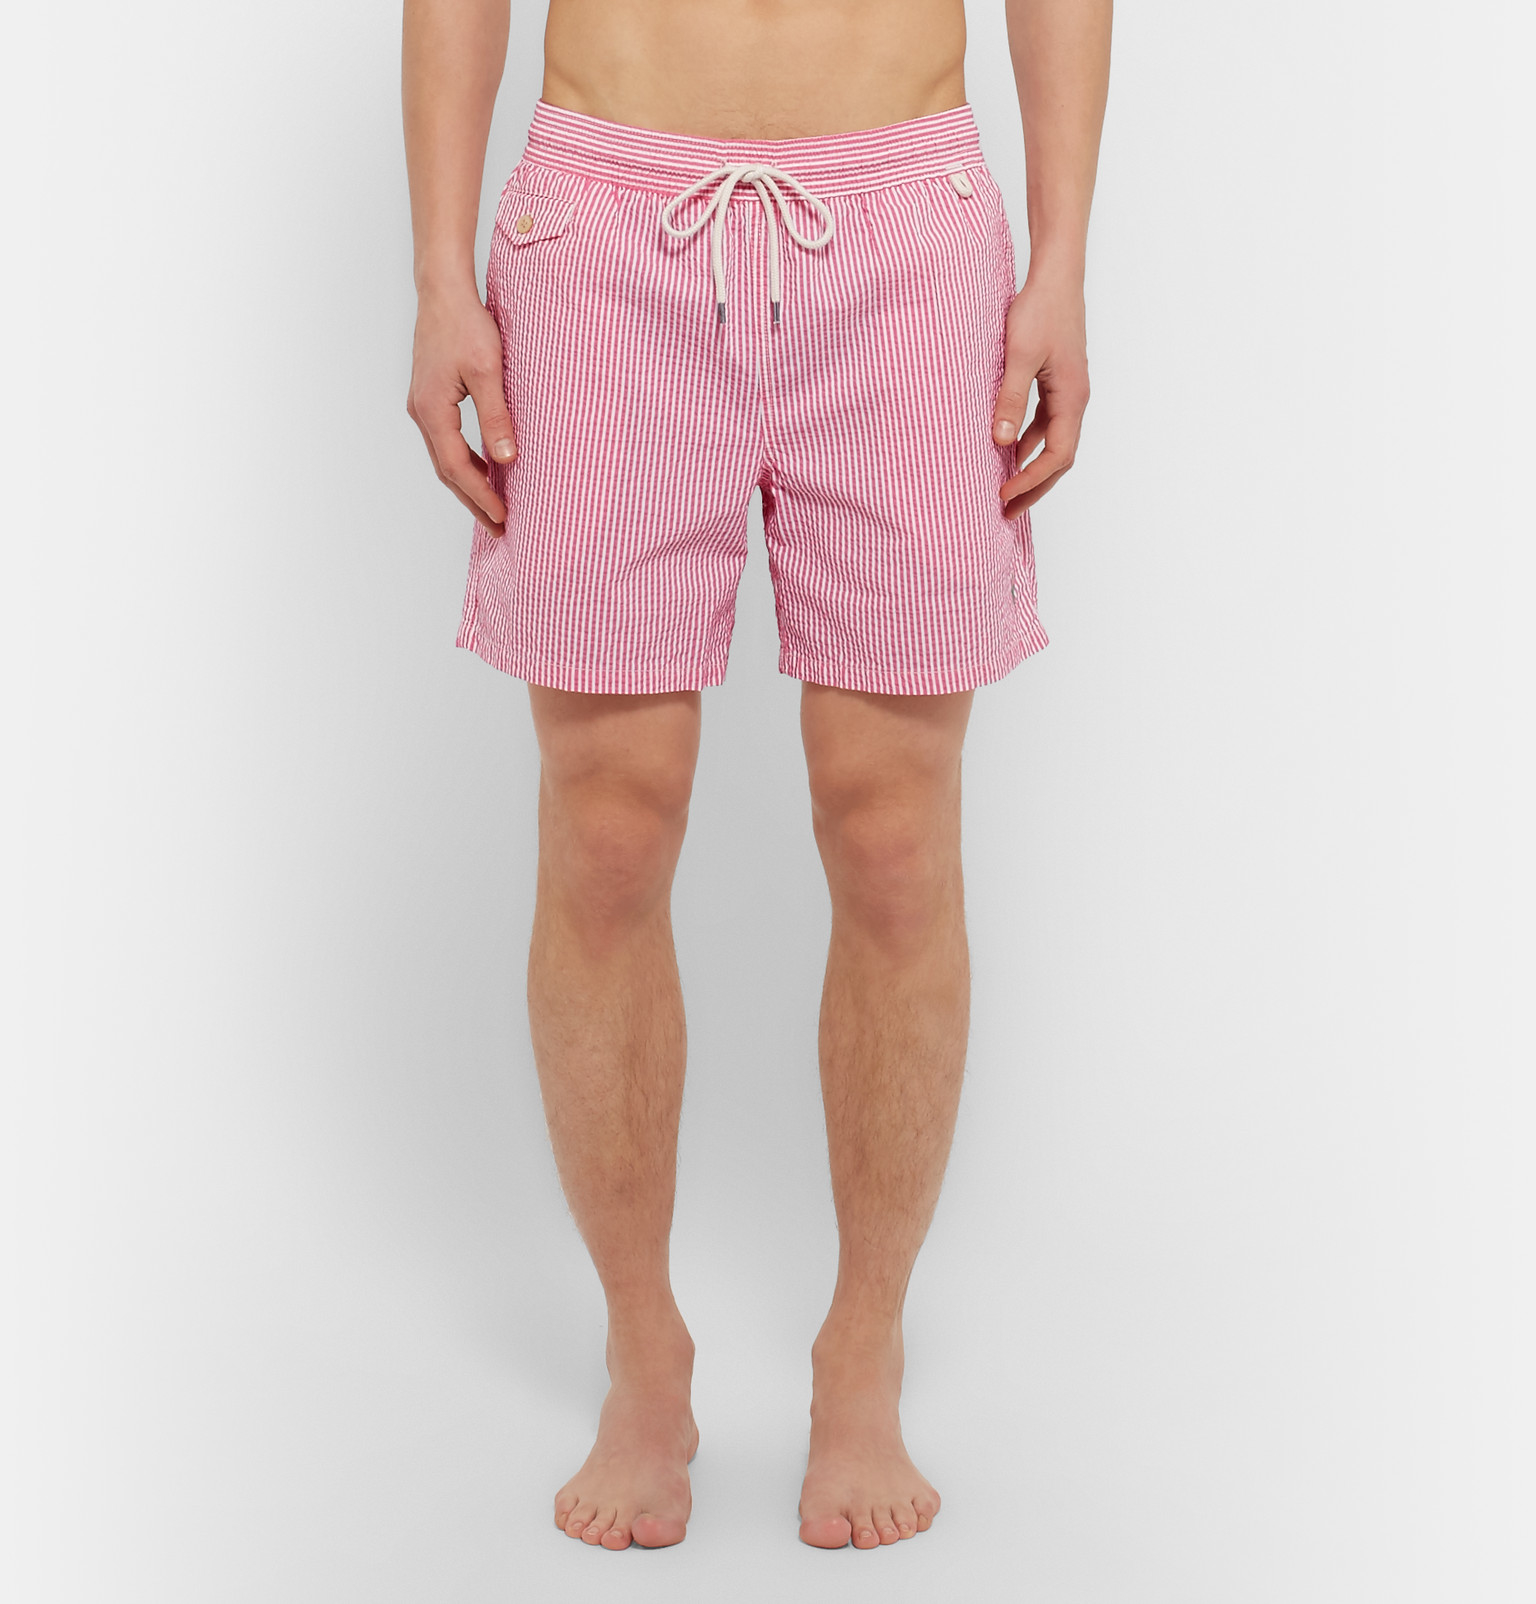 d7f8af537f Polo Ralph Lauren Traveler Striped Seersucker Swim Shorts in Pink ...